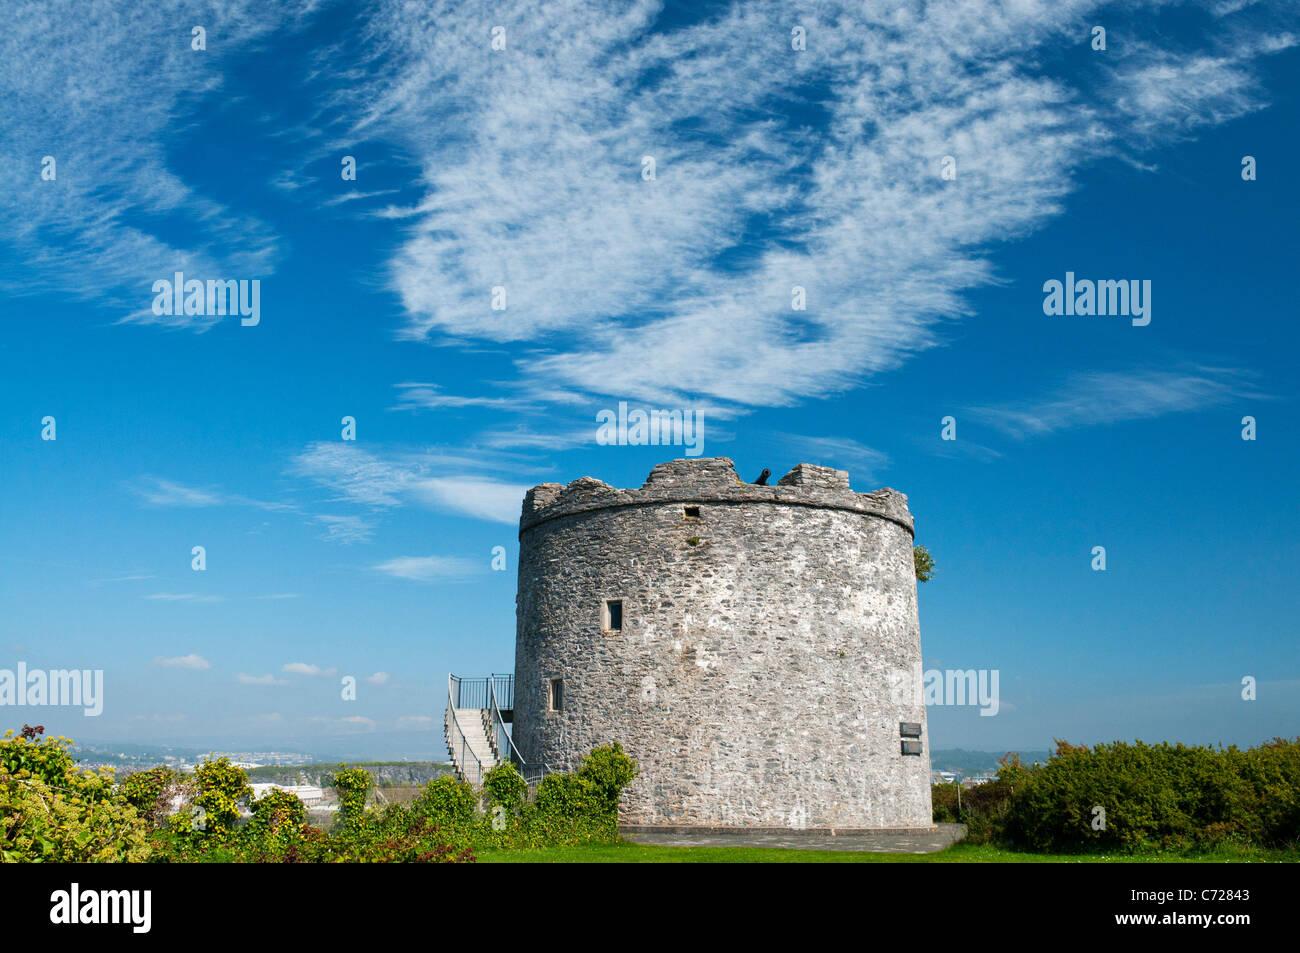 Seventeenth century artillery tower at Mount Batten, Plymouth, Devon UK Stock Photo